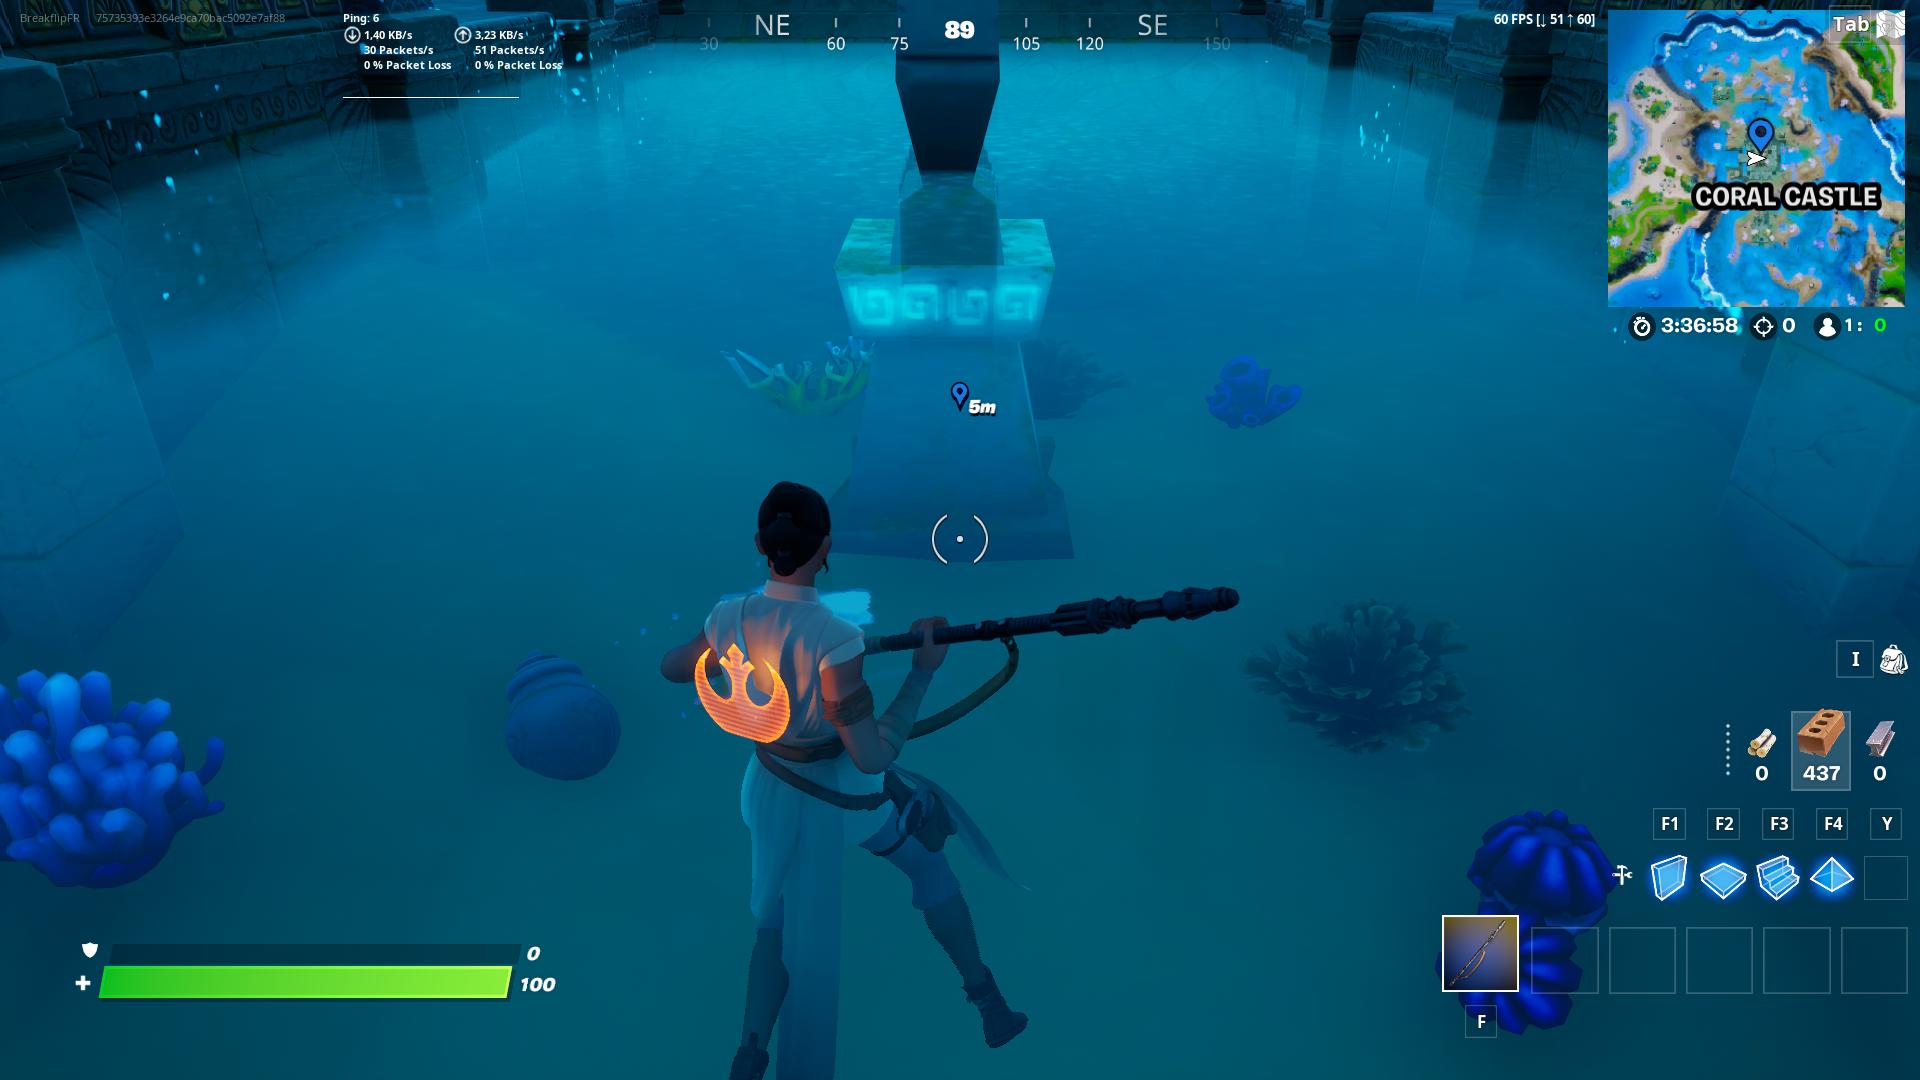 relique-coral-castle-stealthy-stronghold-defi-fortnite-6